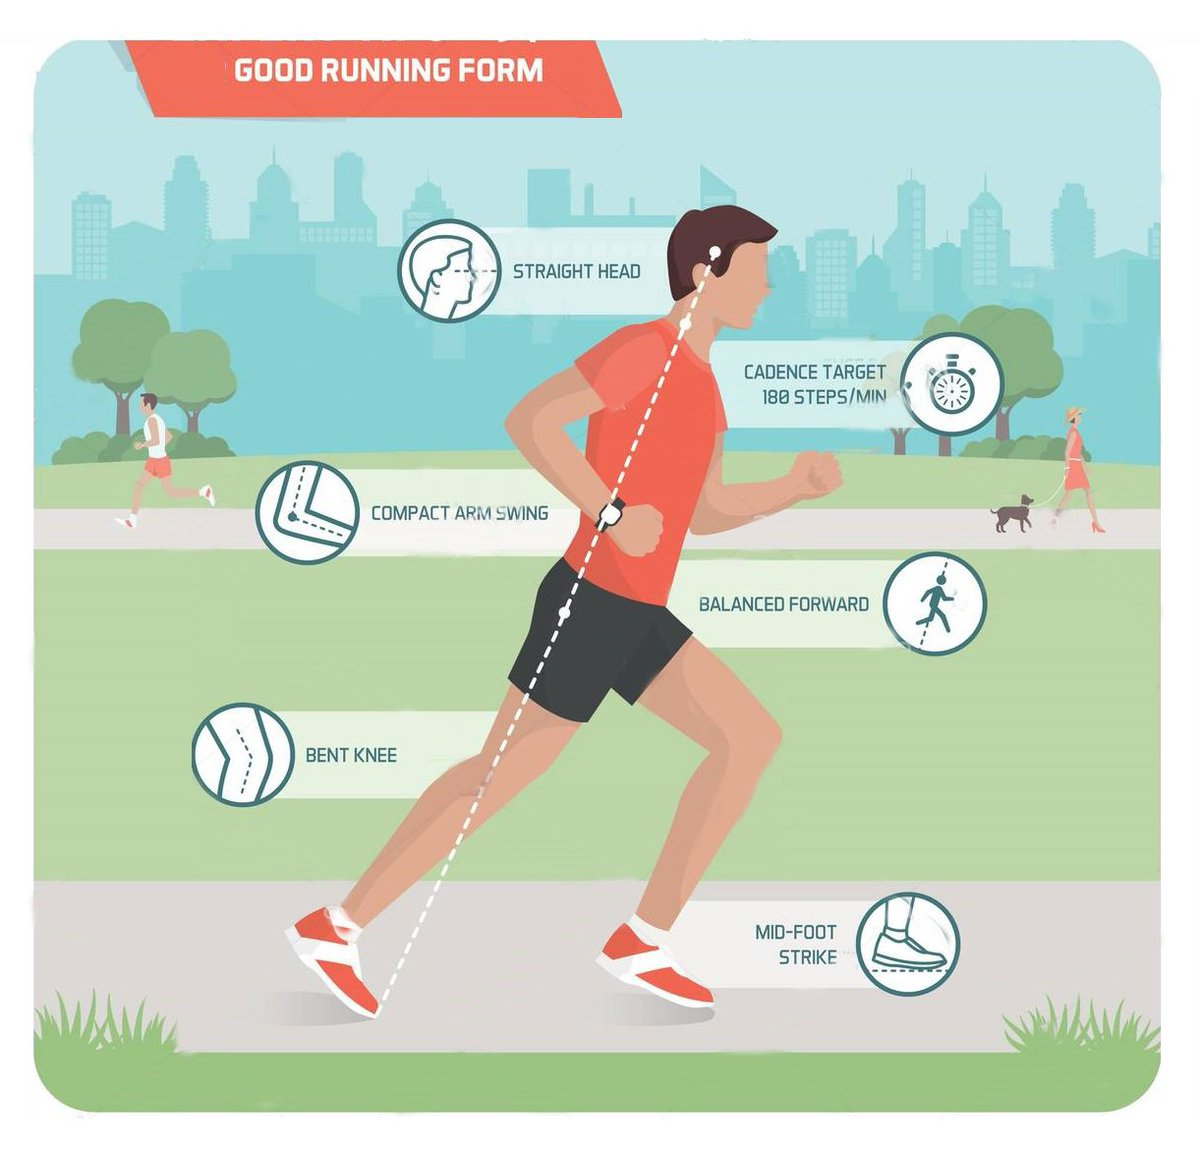 For Good running  http:// mdubmedical.com  &nbsp;   #Running #Runner #Run #Runners #Athletics #Athlete #MDUB<br>http://pic.twitter.com/7VzddM9bxk